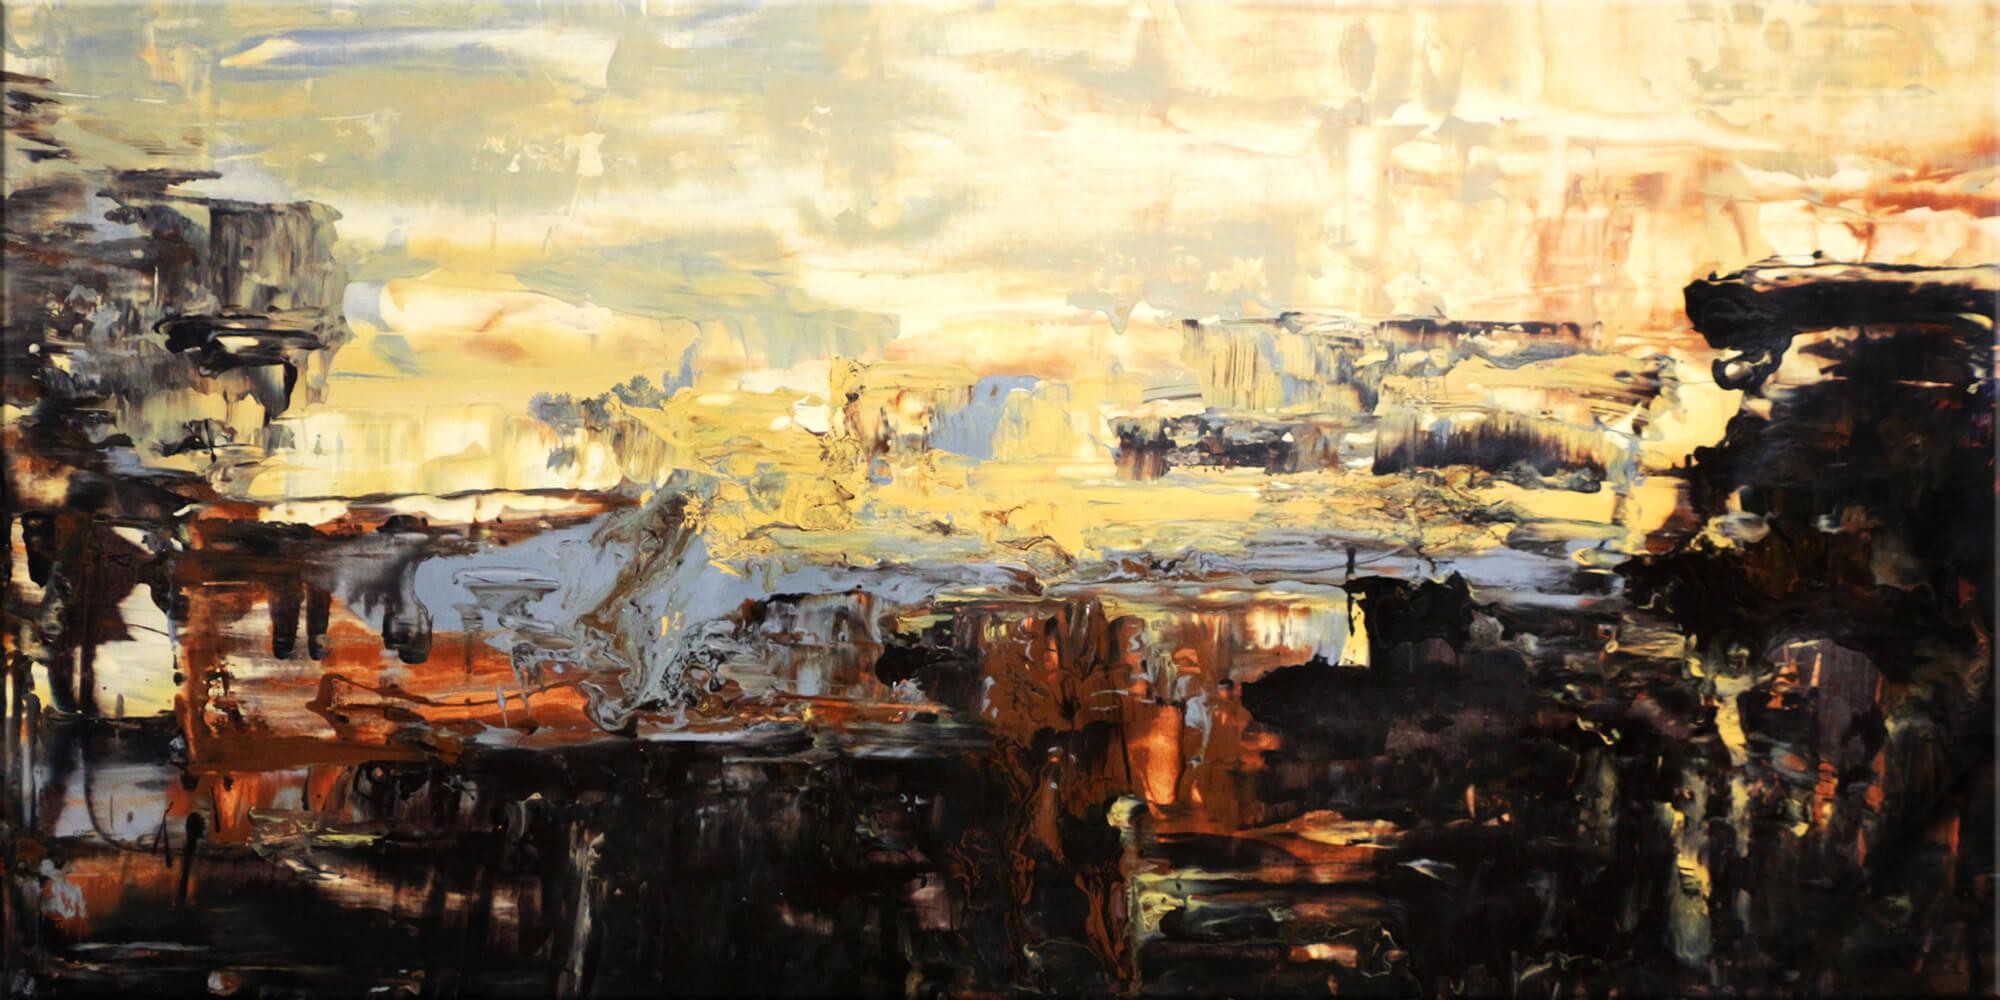 Original Gemälde von Noah de Jong Abendhimmel